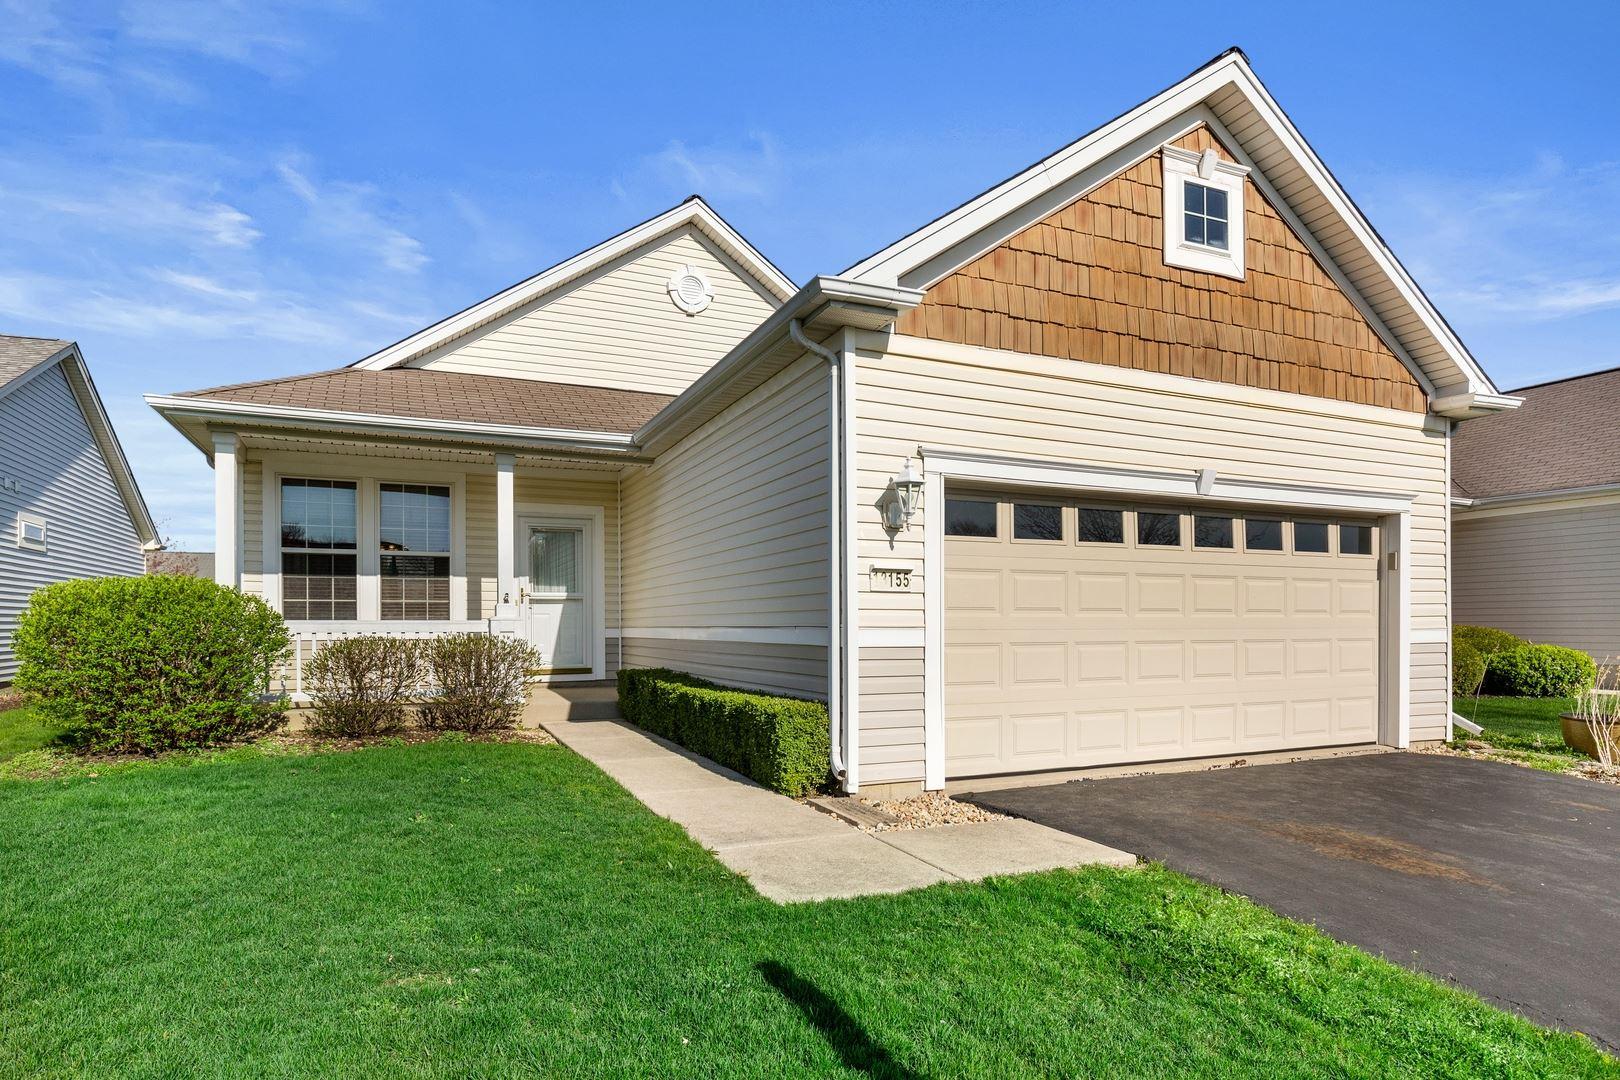 13155 Cold Springs Drive, Huntley, IL 60142 - #: 11055055